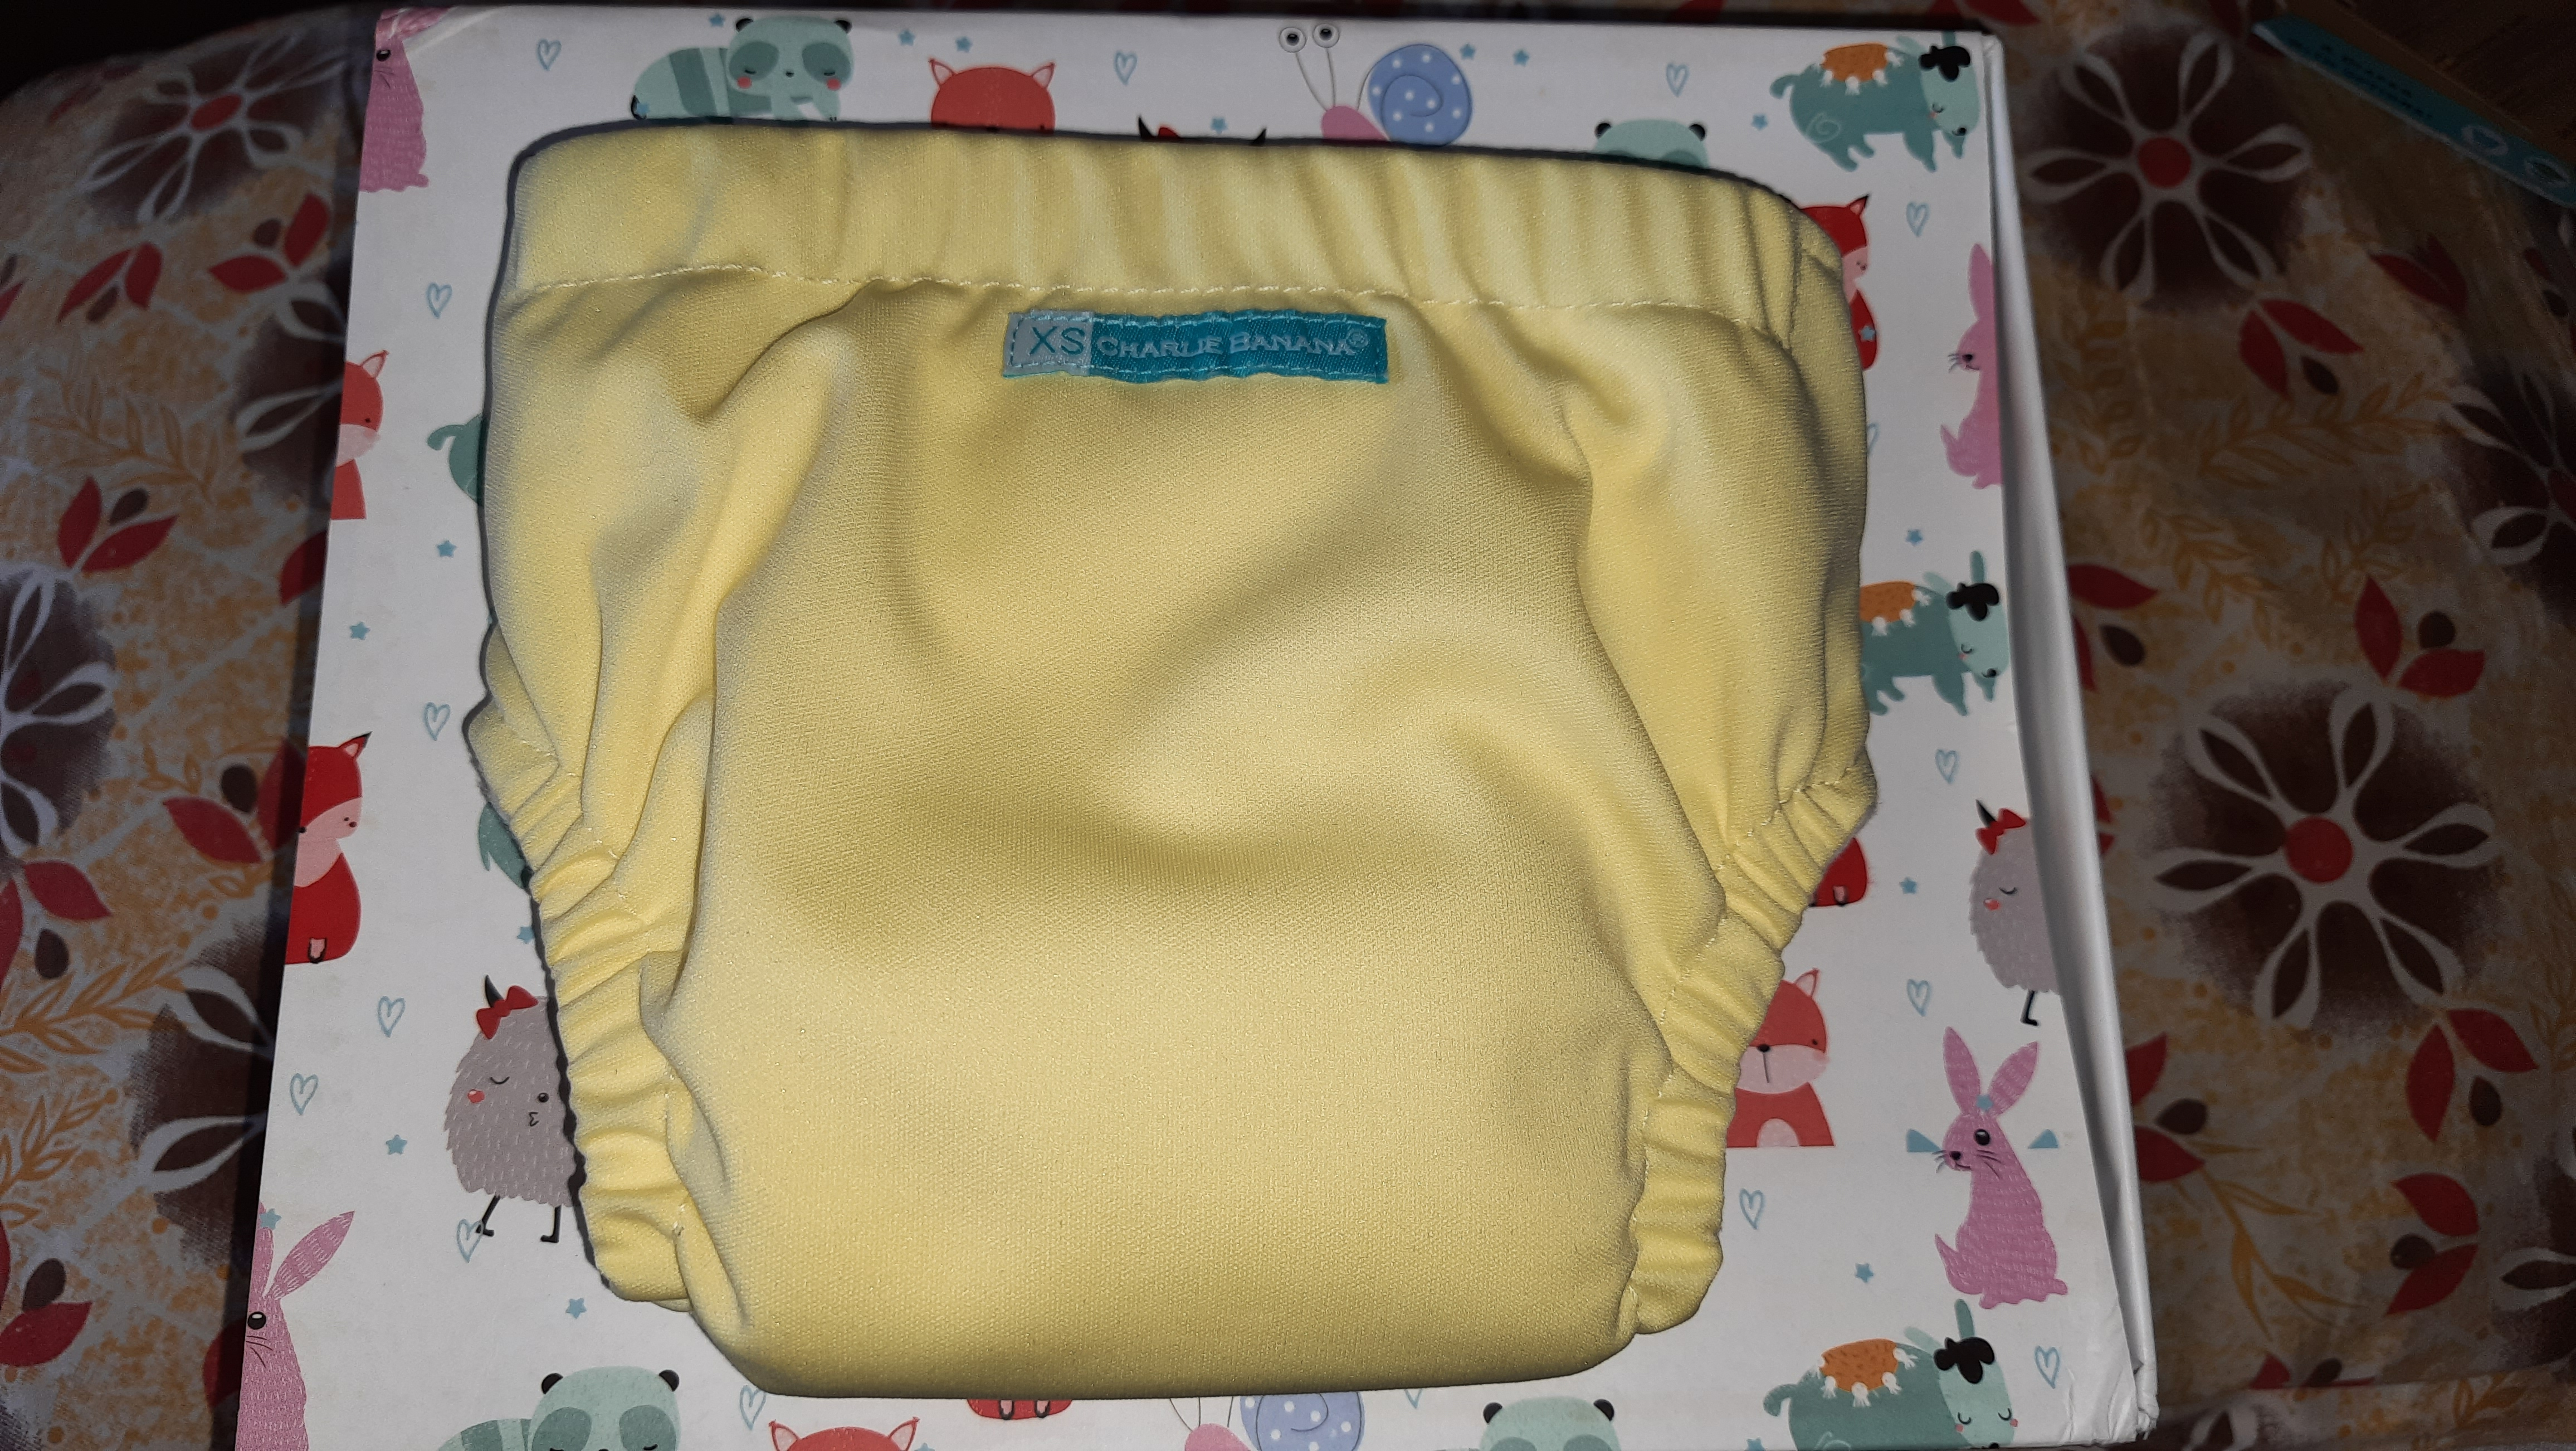 Charlie Banana Newborn Cloth Diaper-Very Gentle for babies-By foodstagram_lav